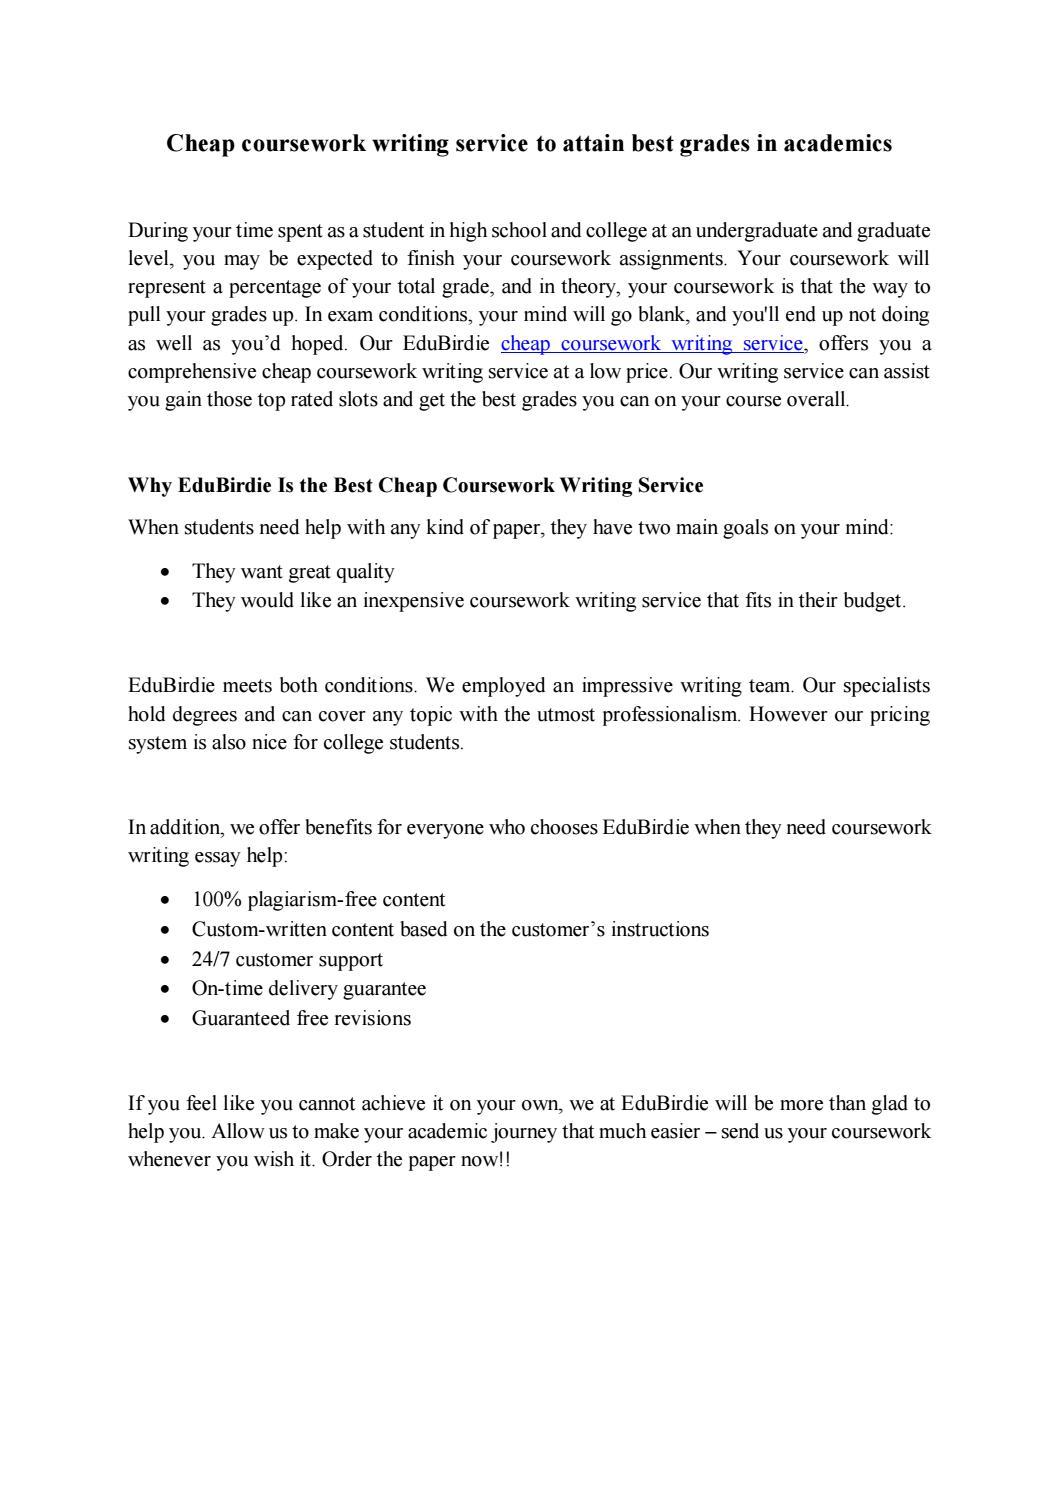 Cheap argumentative essay ghostwriting website us